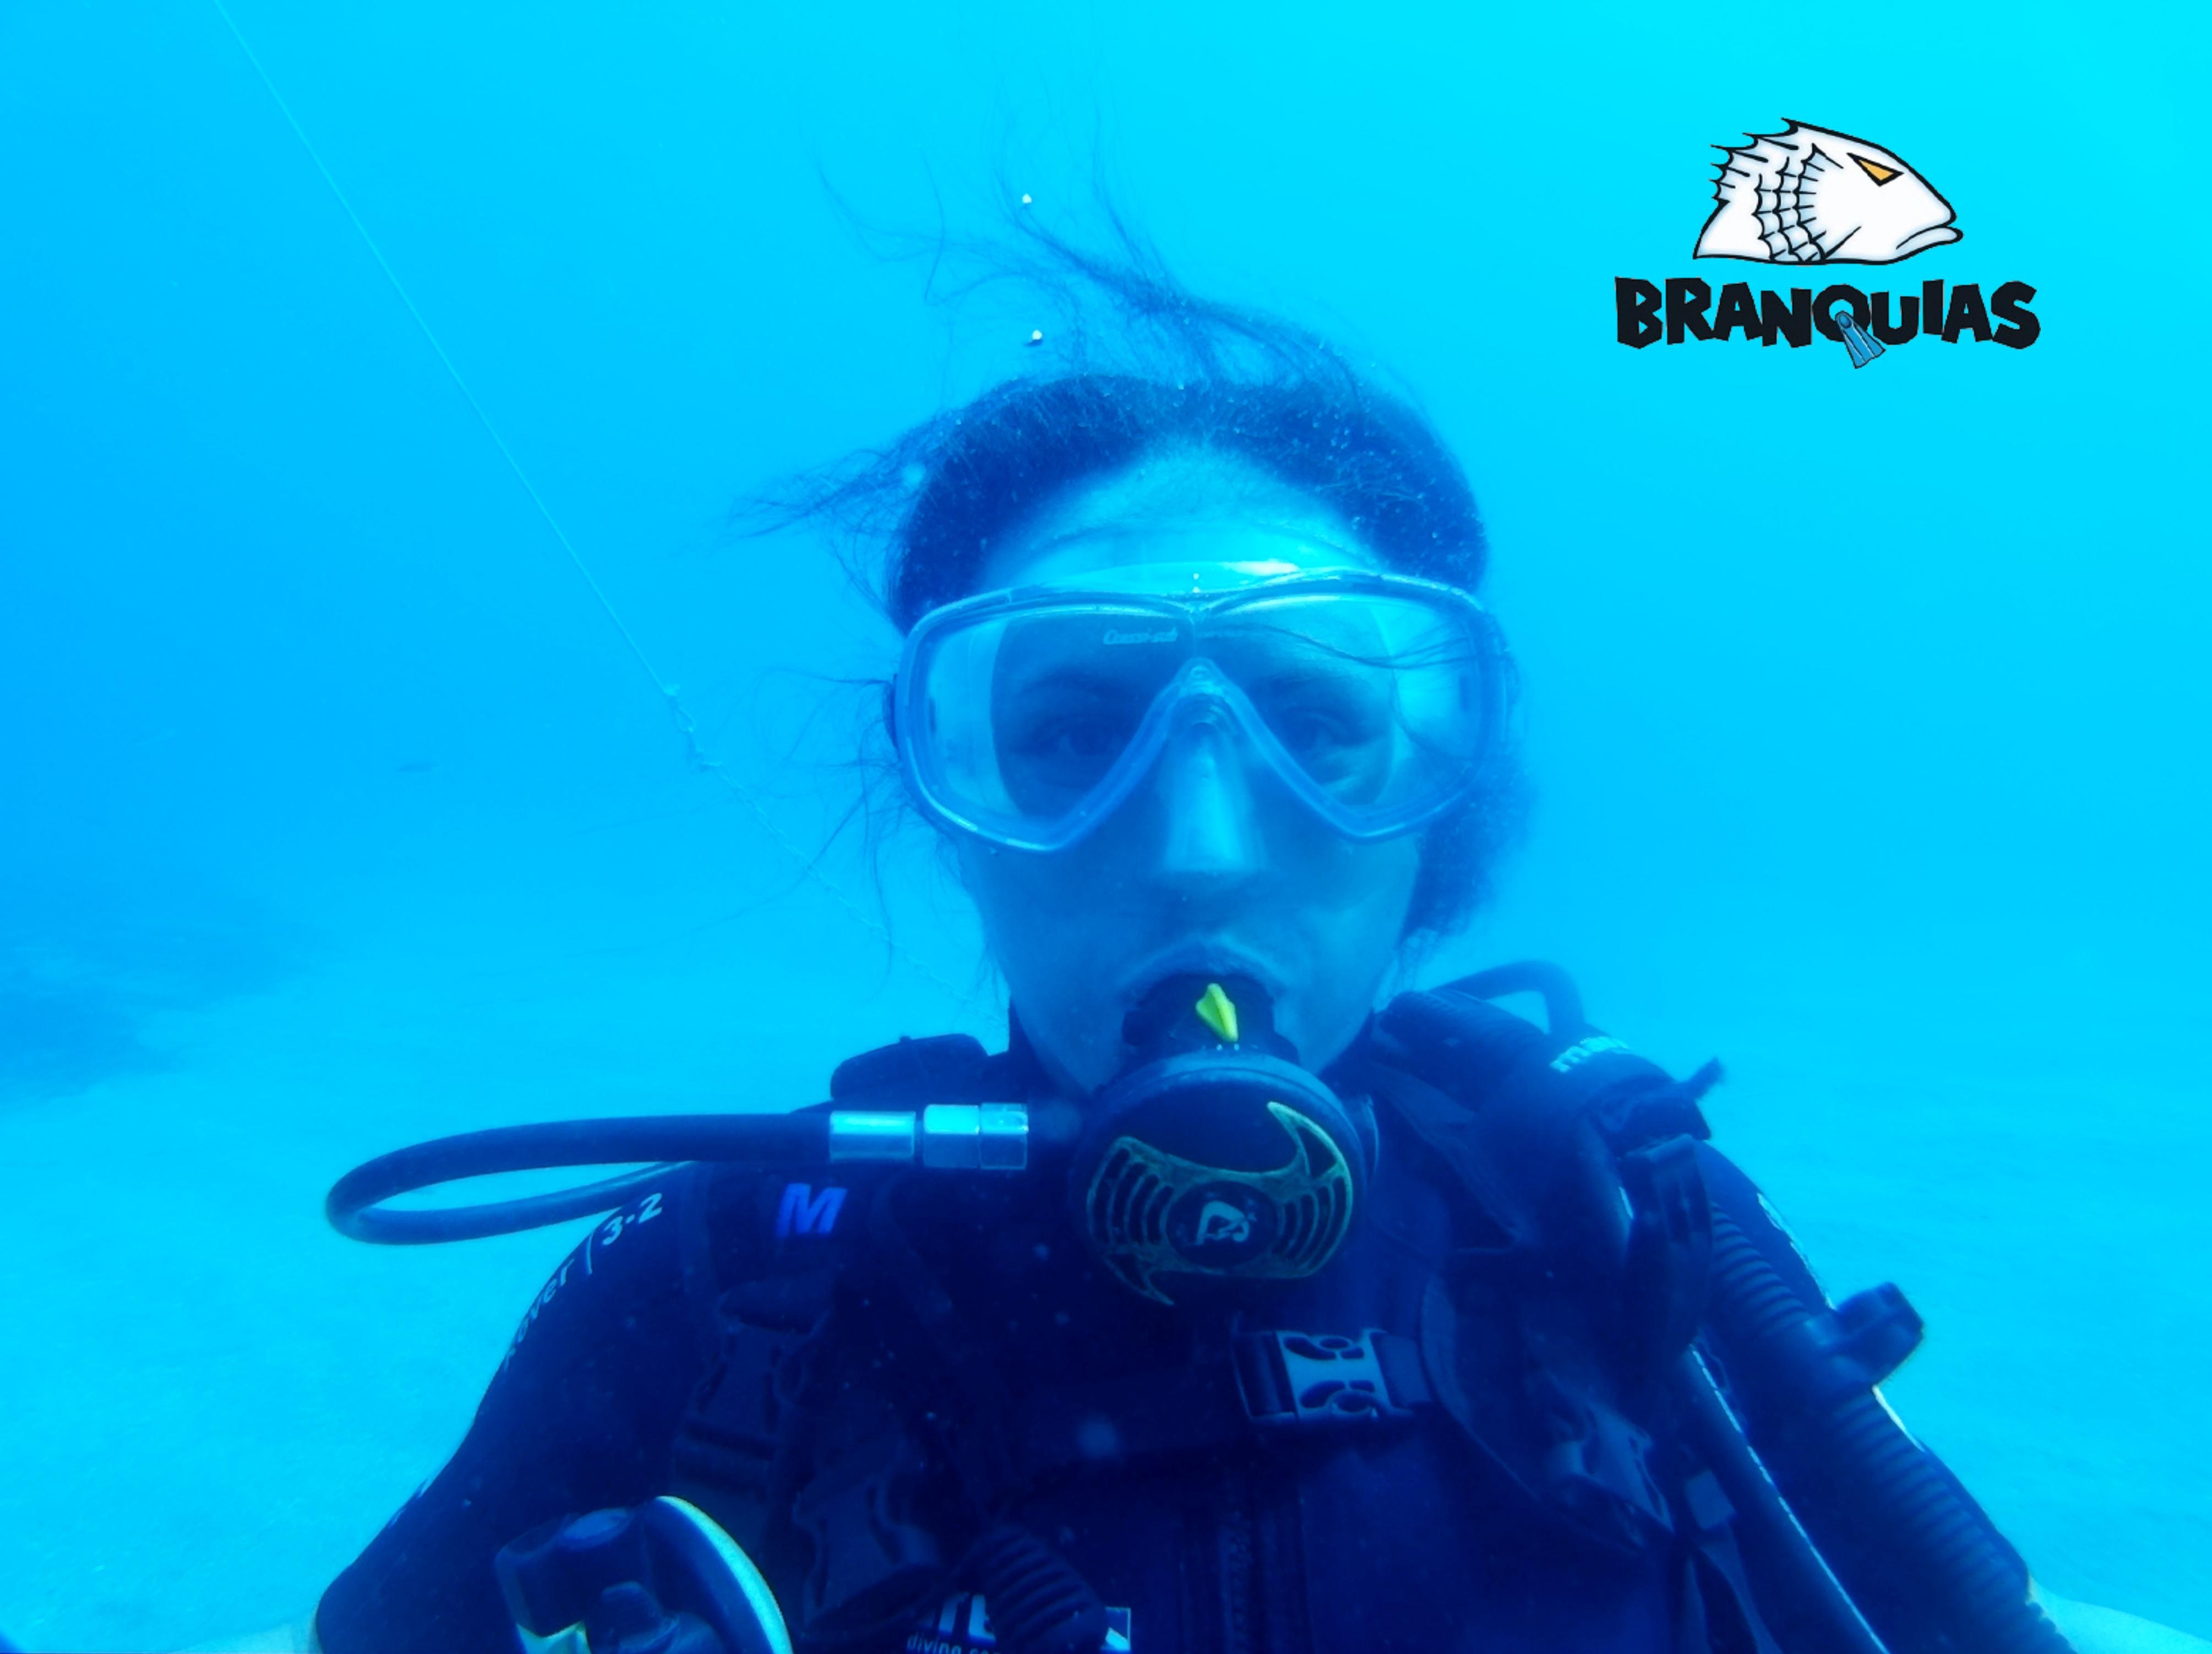 buceo Branquias Carboneras